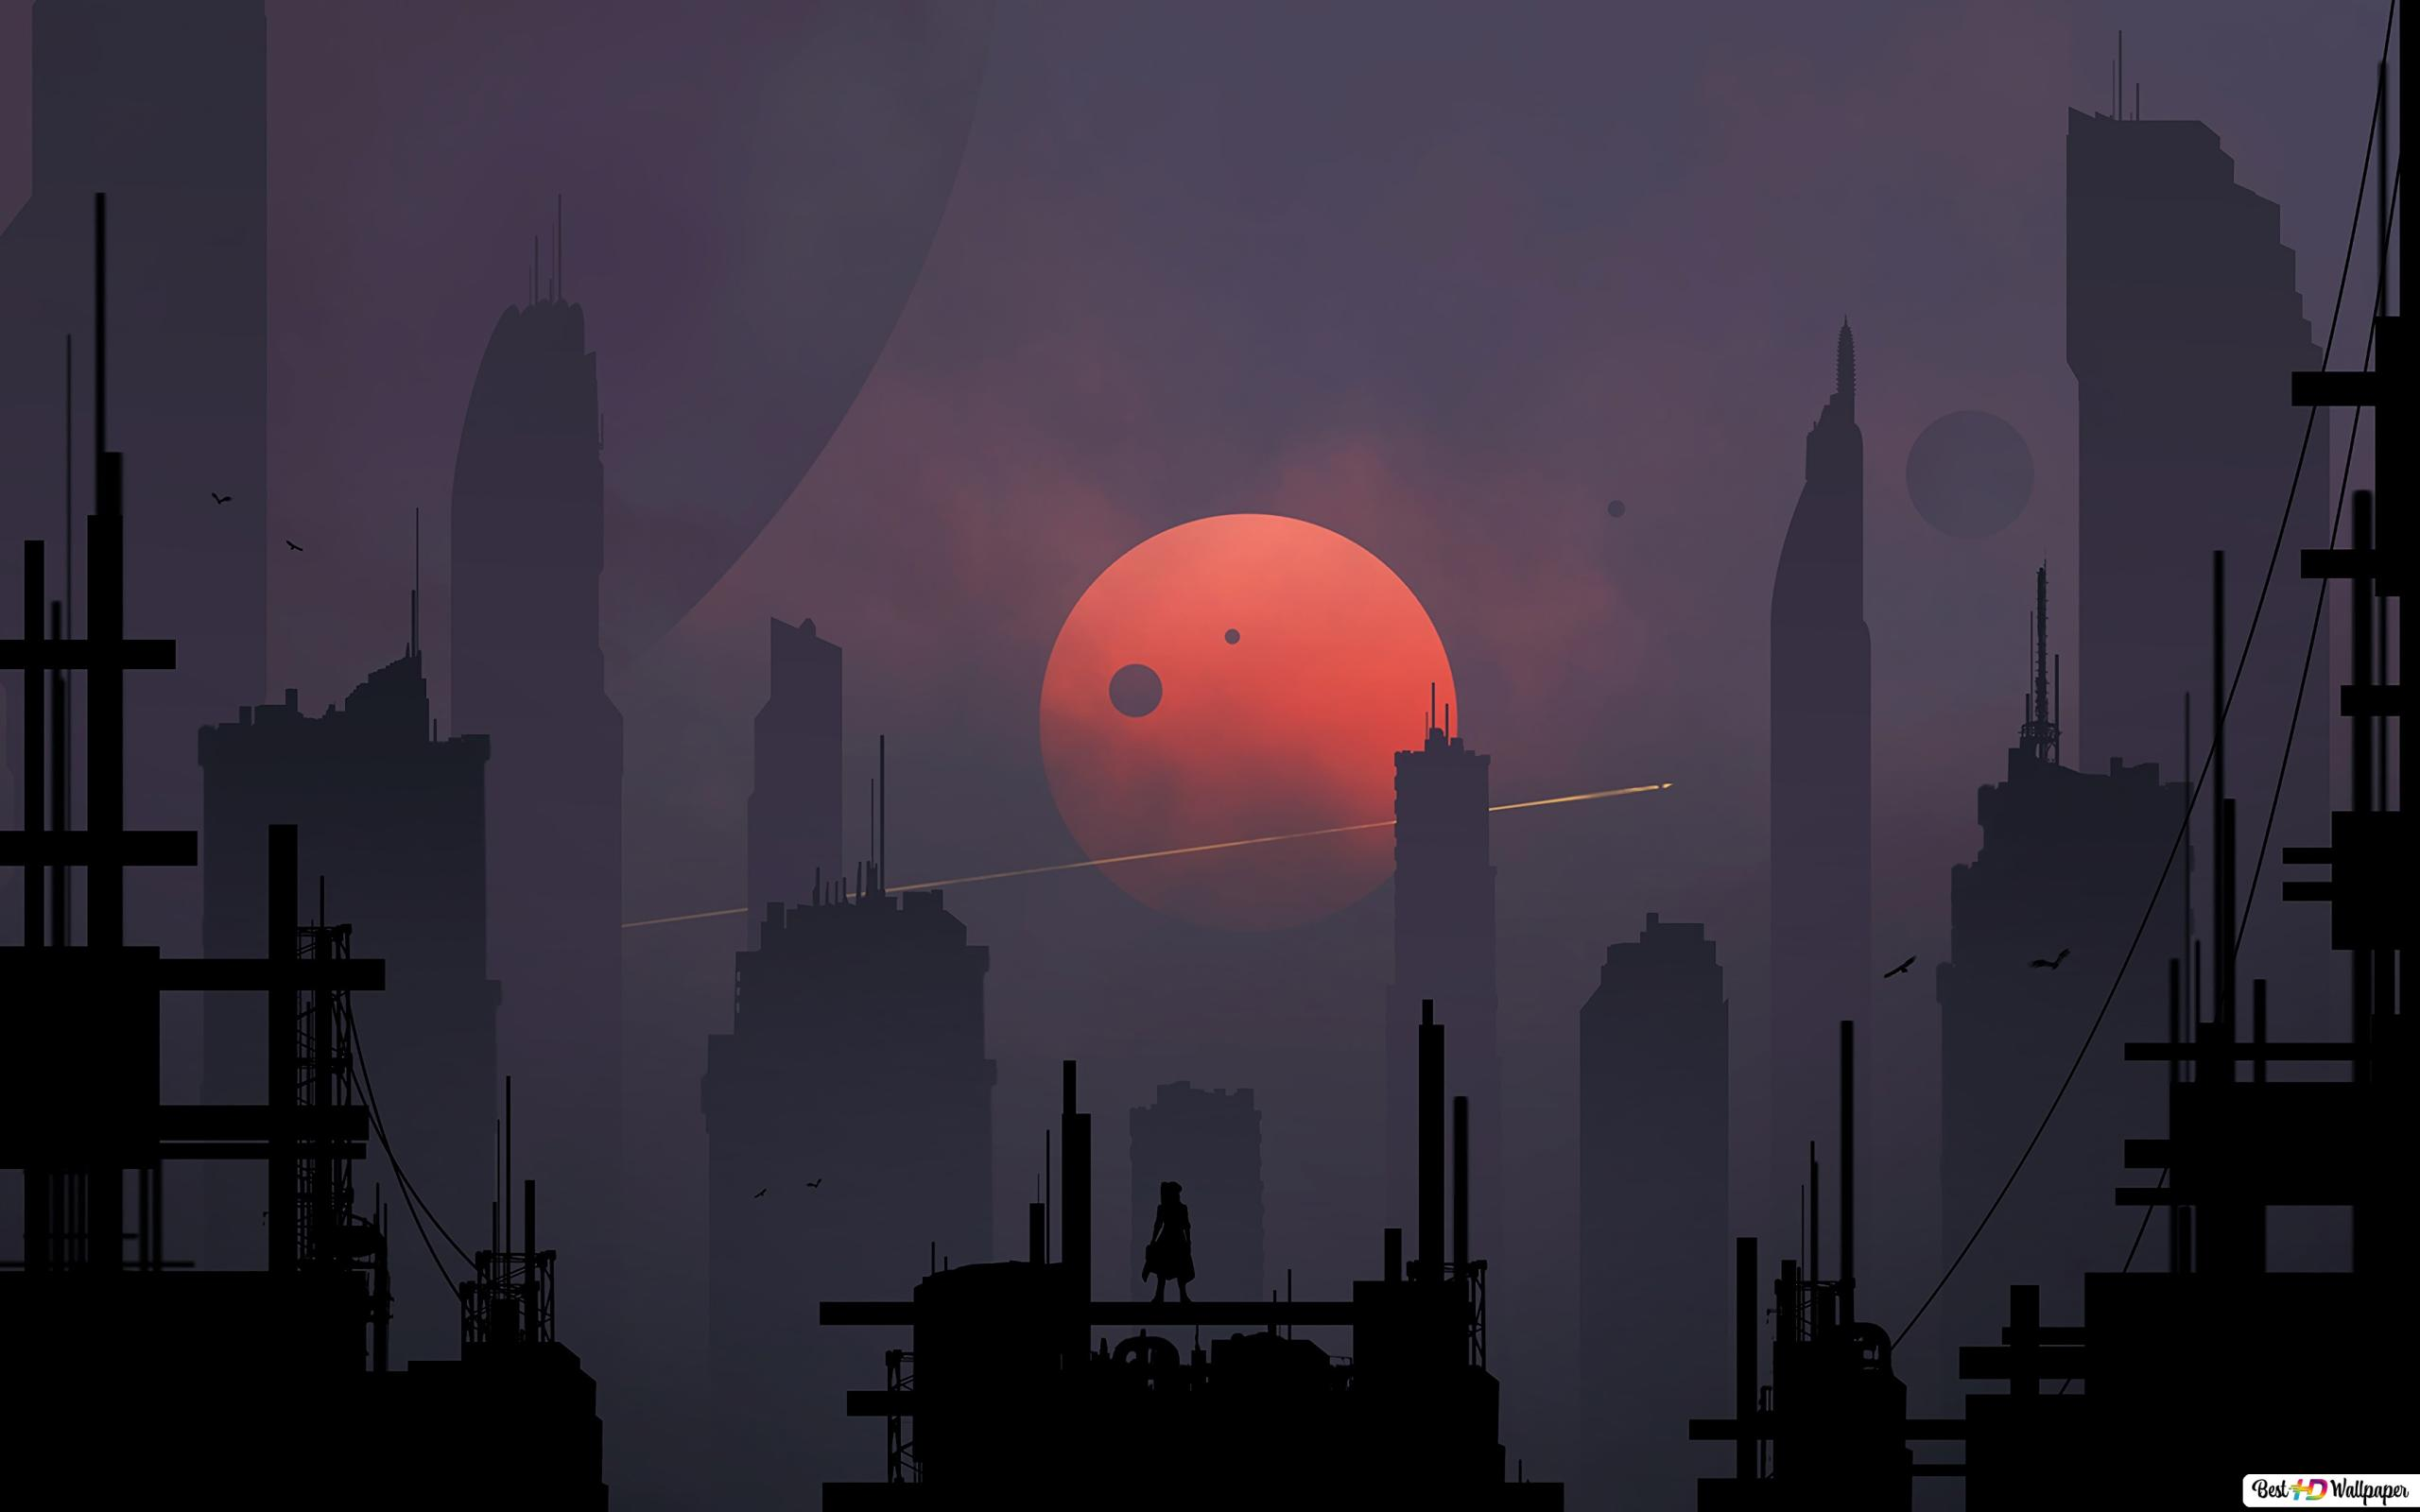 Red Moon HD wallpaper download